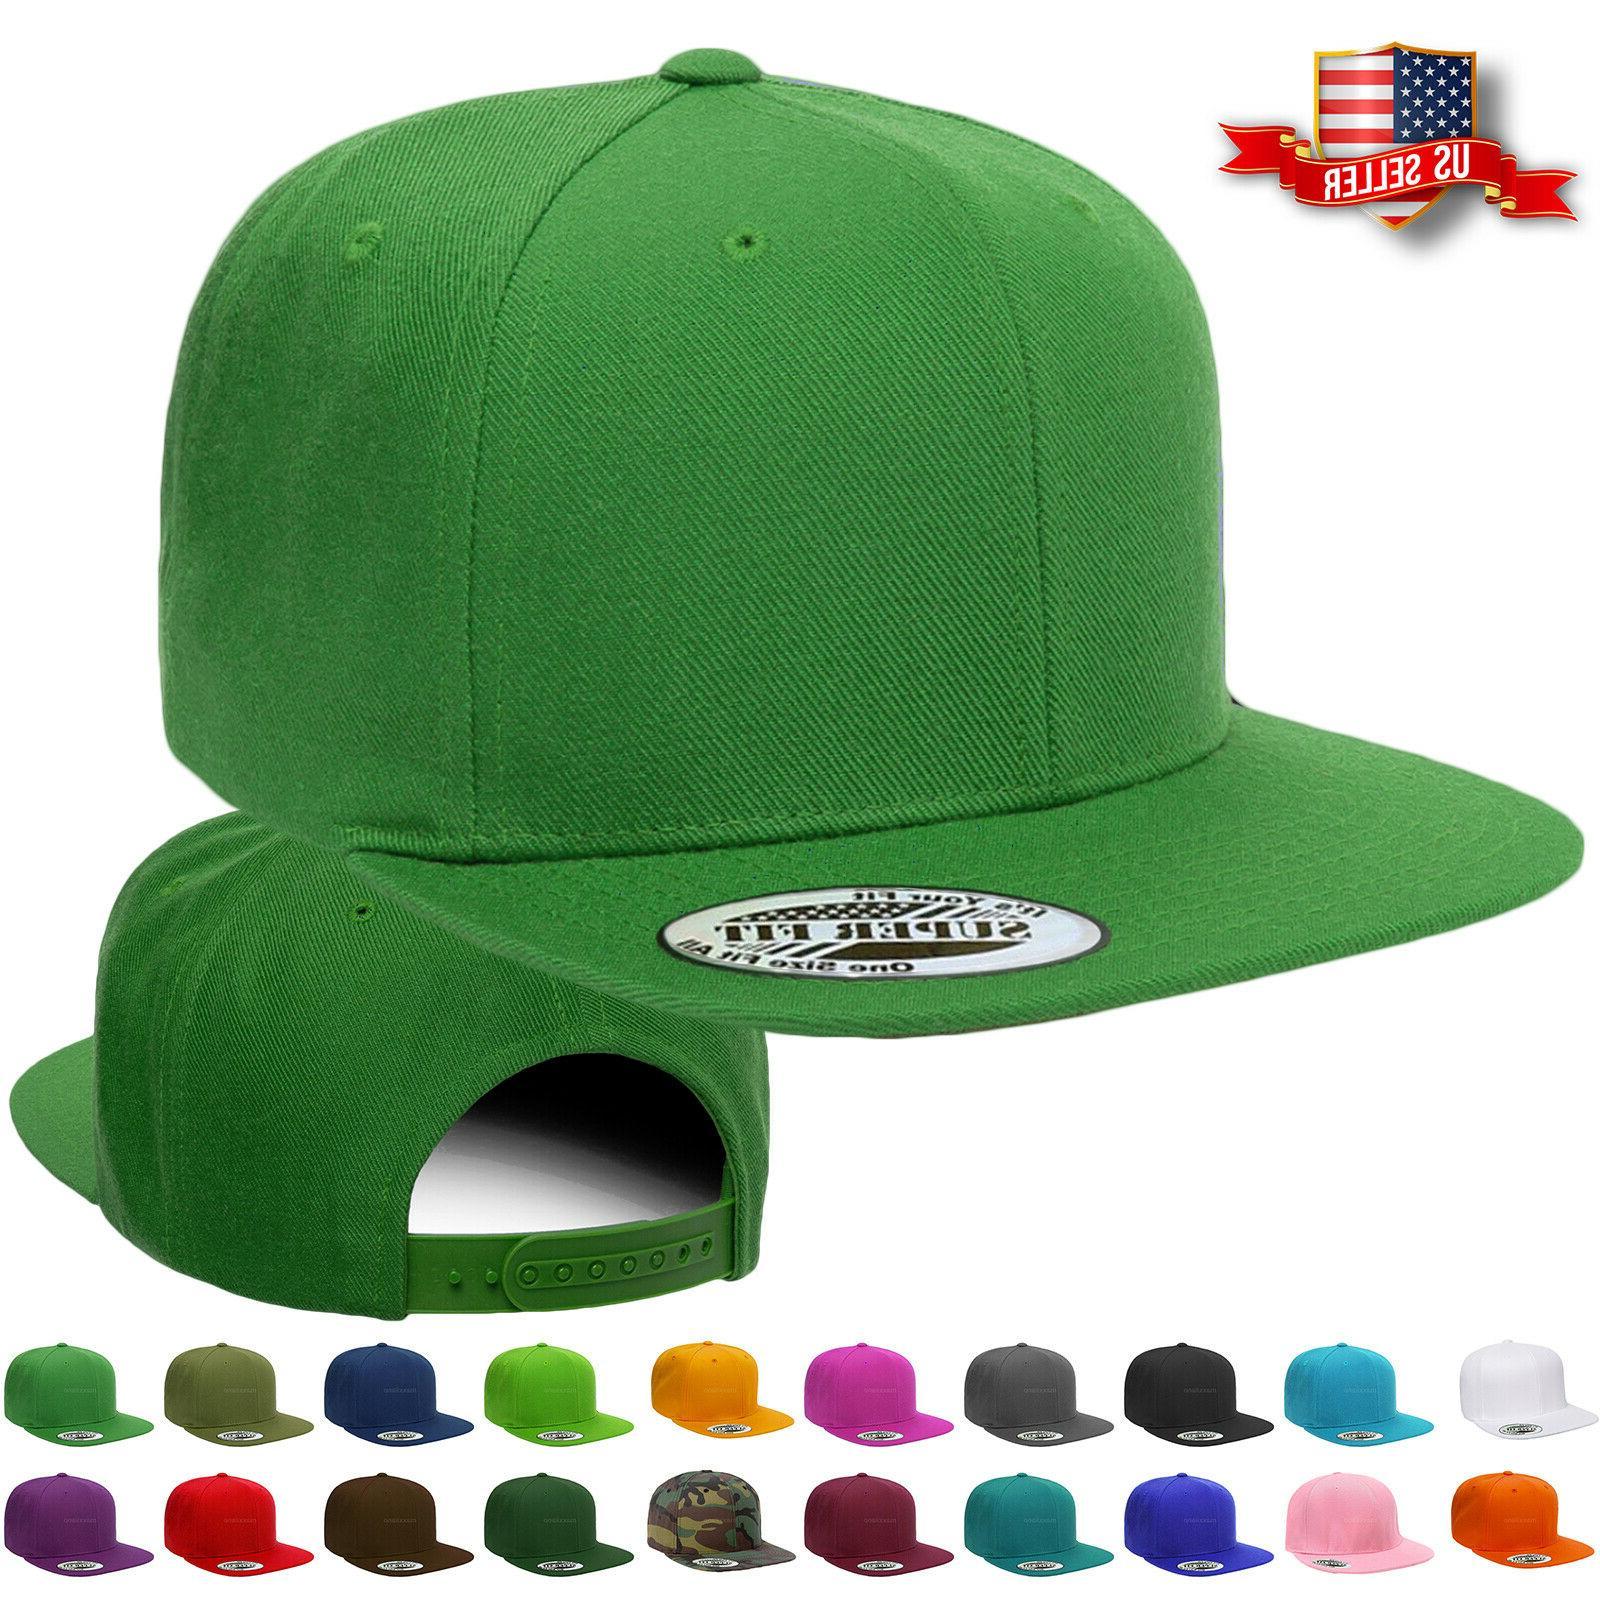 hat classic hip hop style visor plain